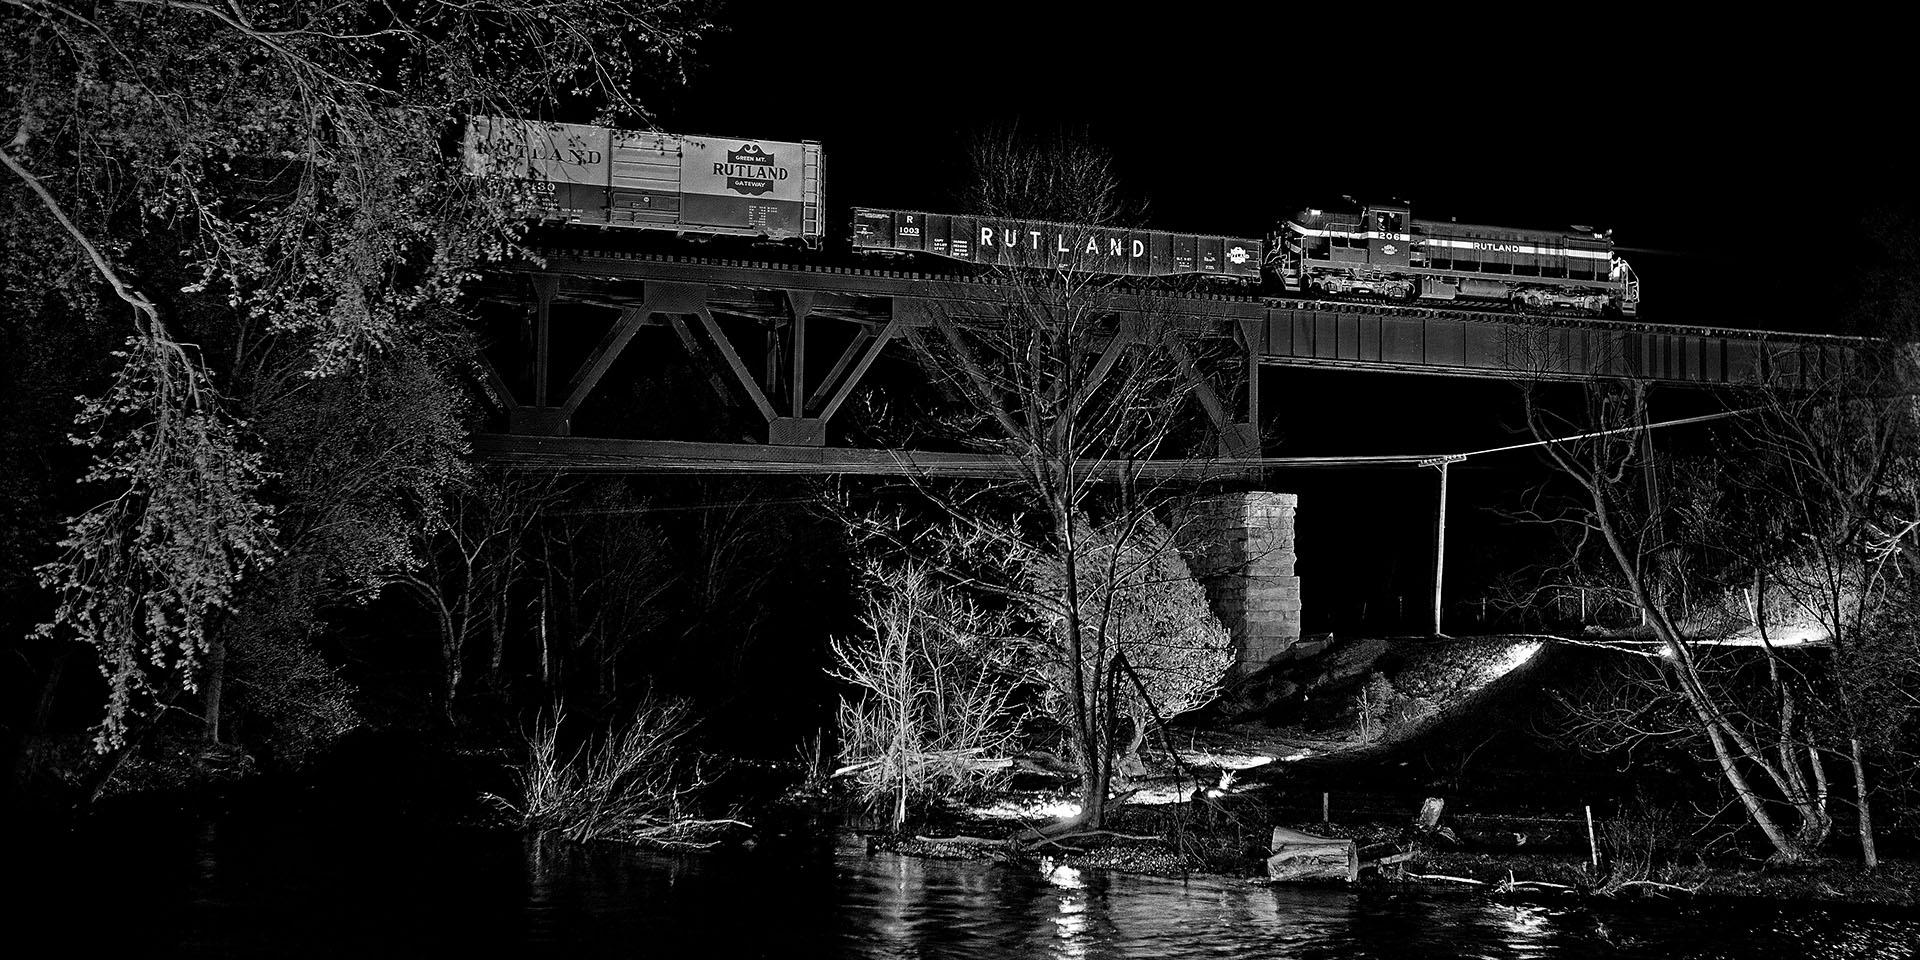 Rutland night, by Jim Shaughnessy